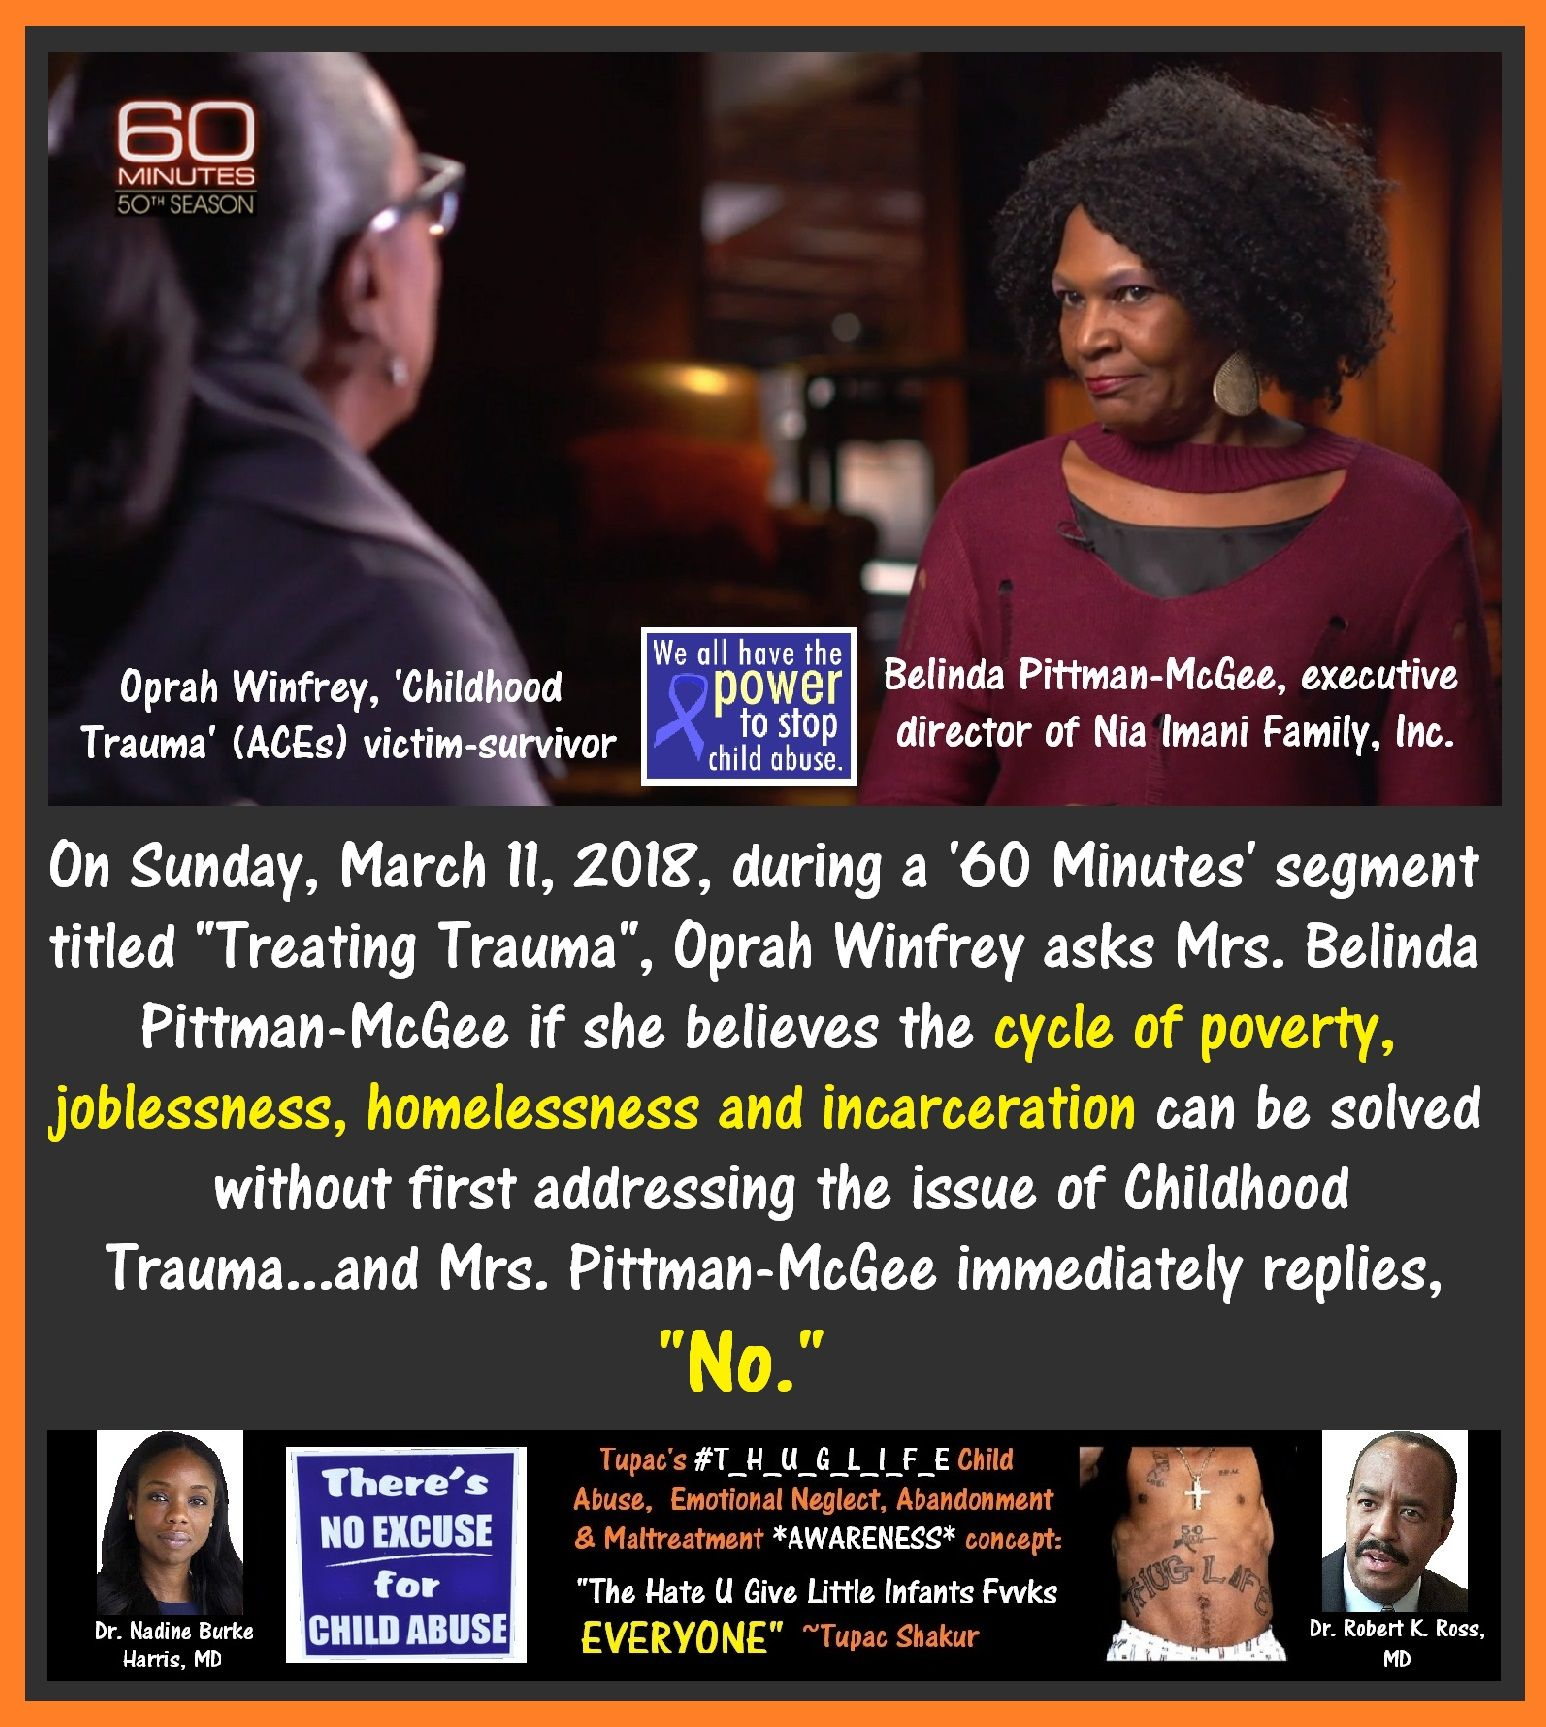 _Belinda Pittman-McGee Oprah Winfrey_02.jpg